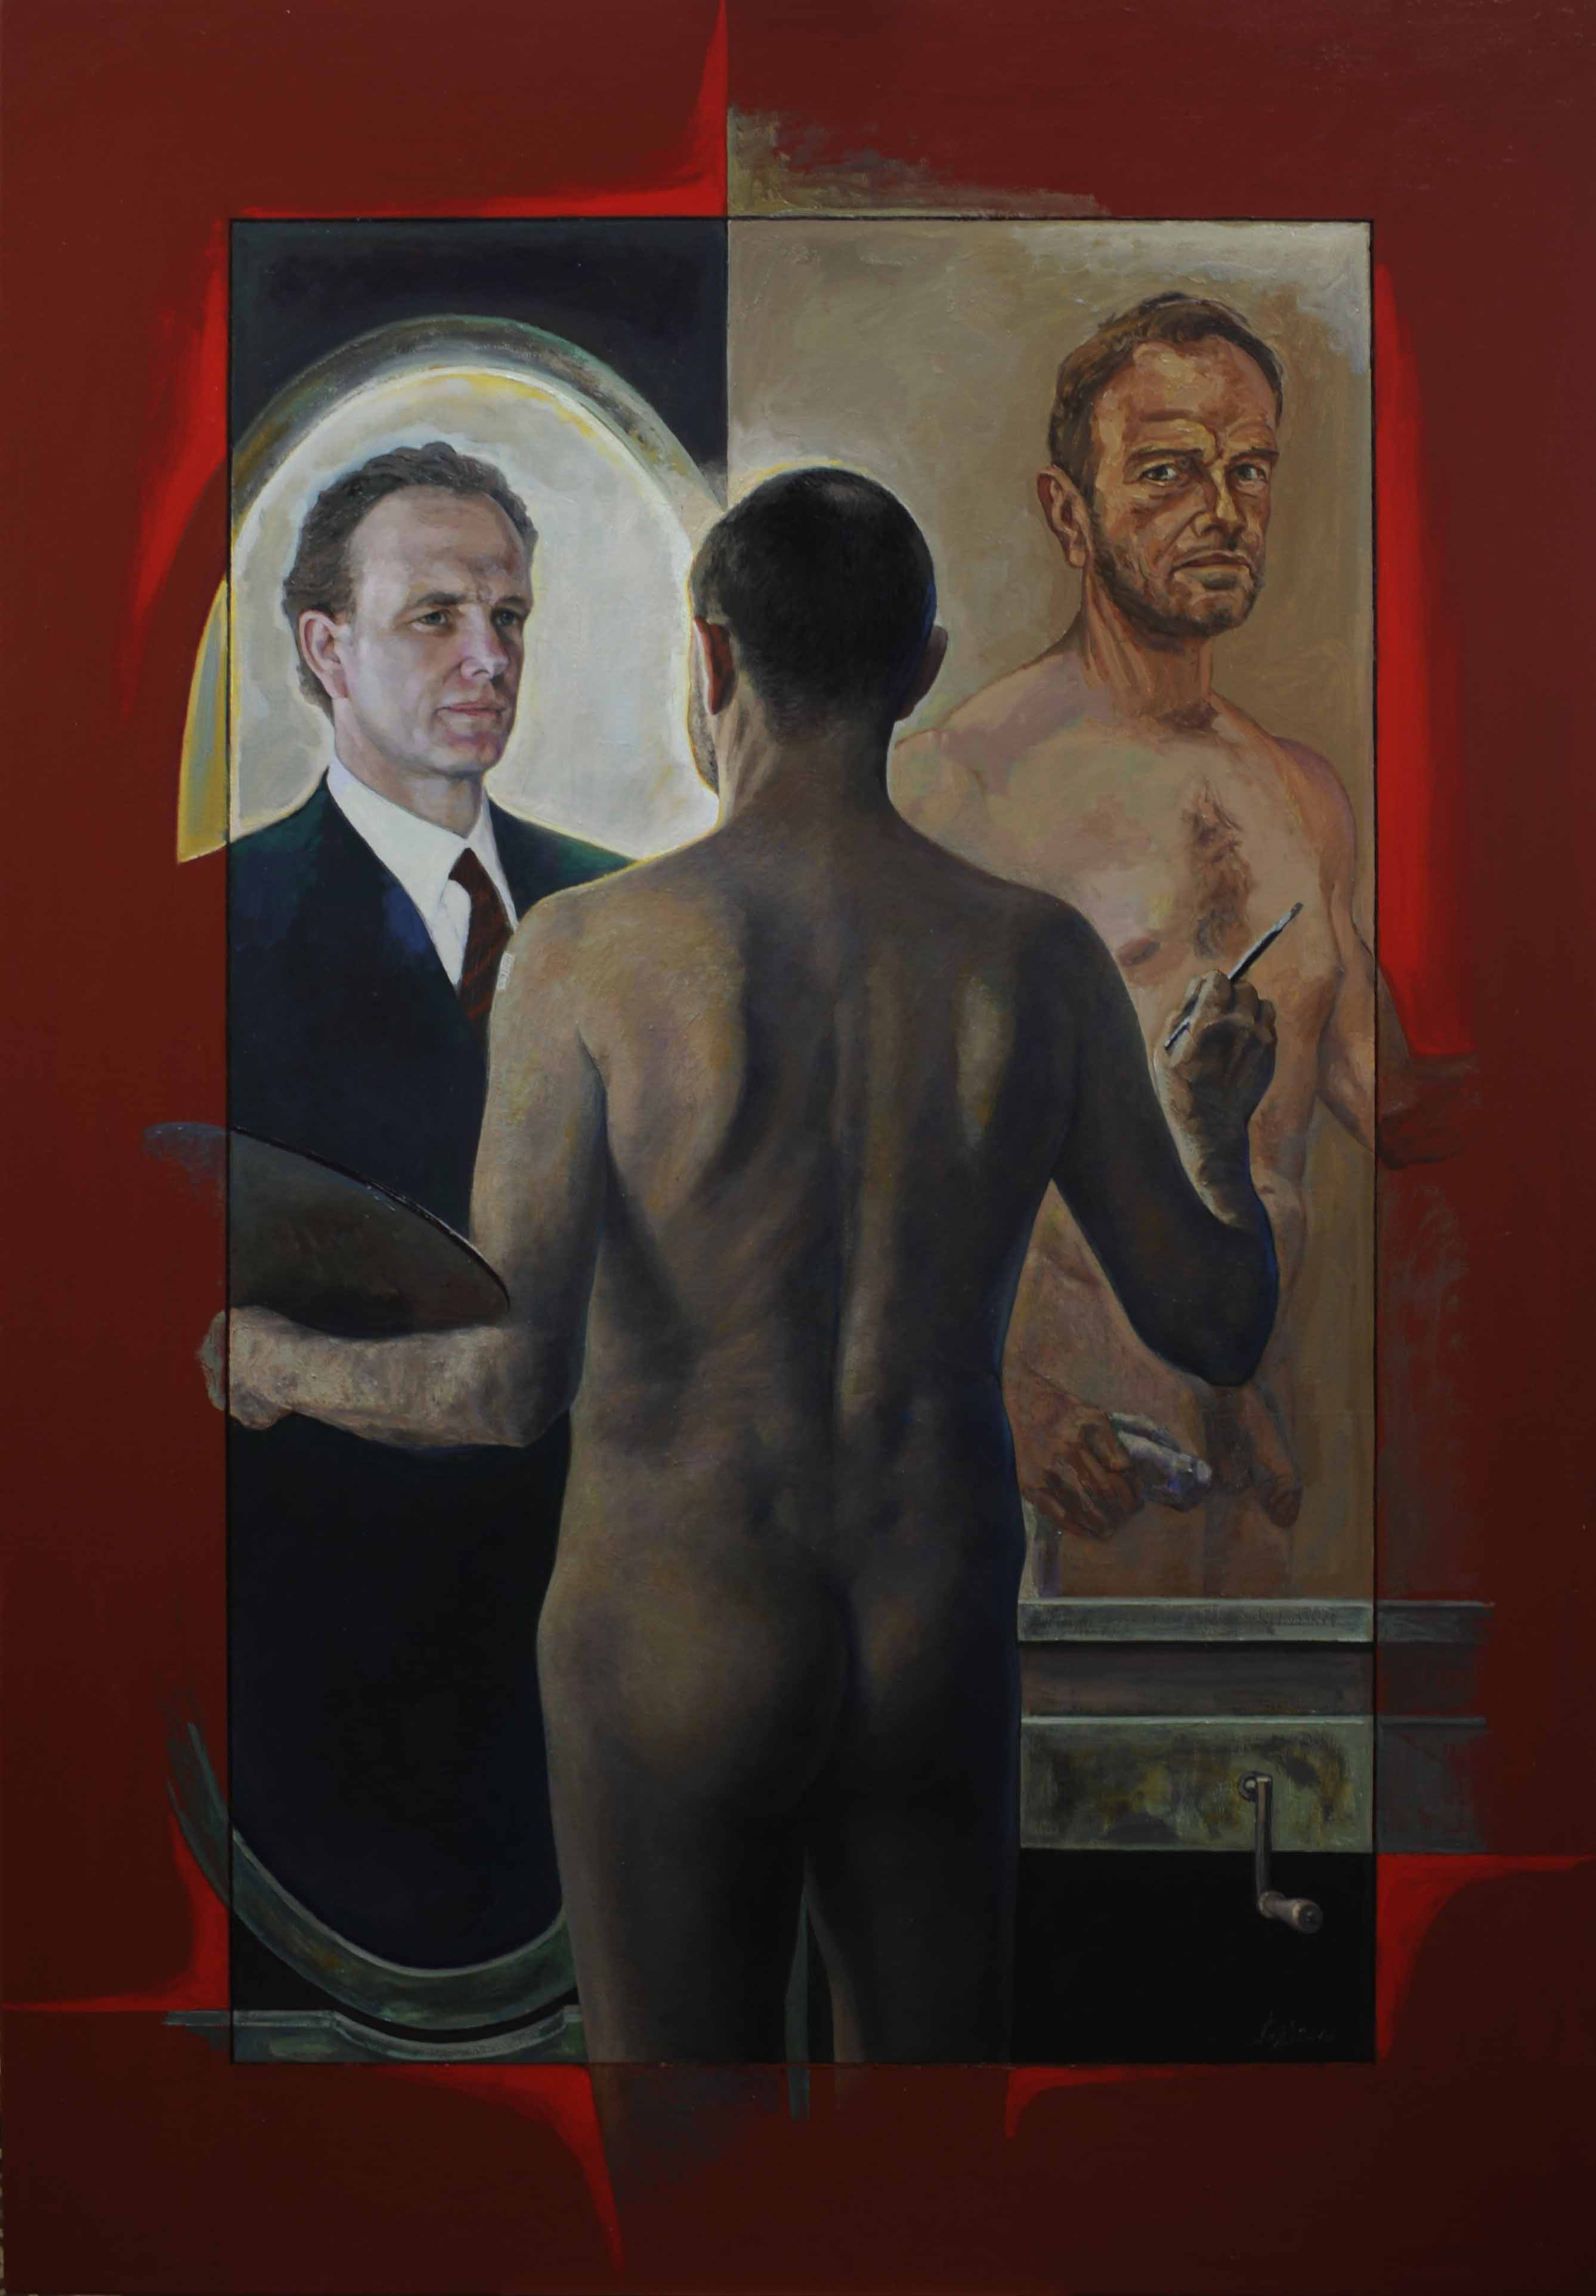 13 Andrew Sayers 安德鲁赛耶斯(2016) oil 198 x 137cm